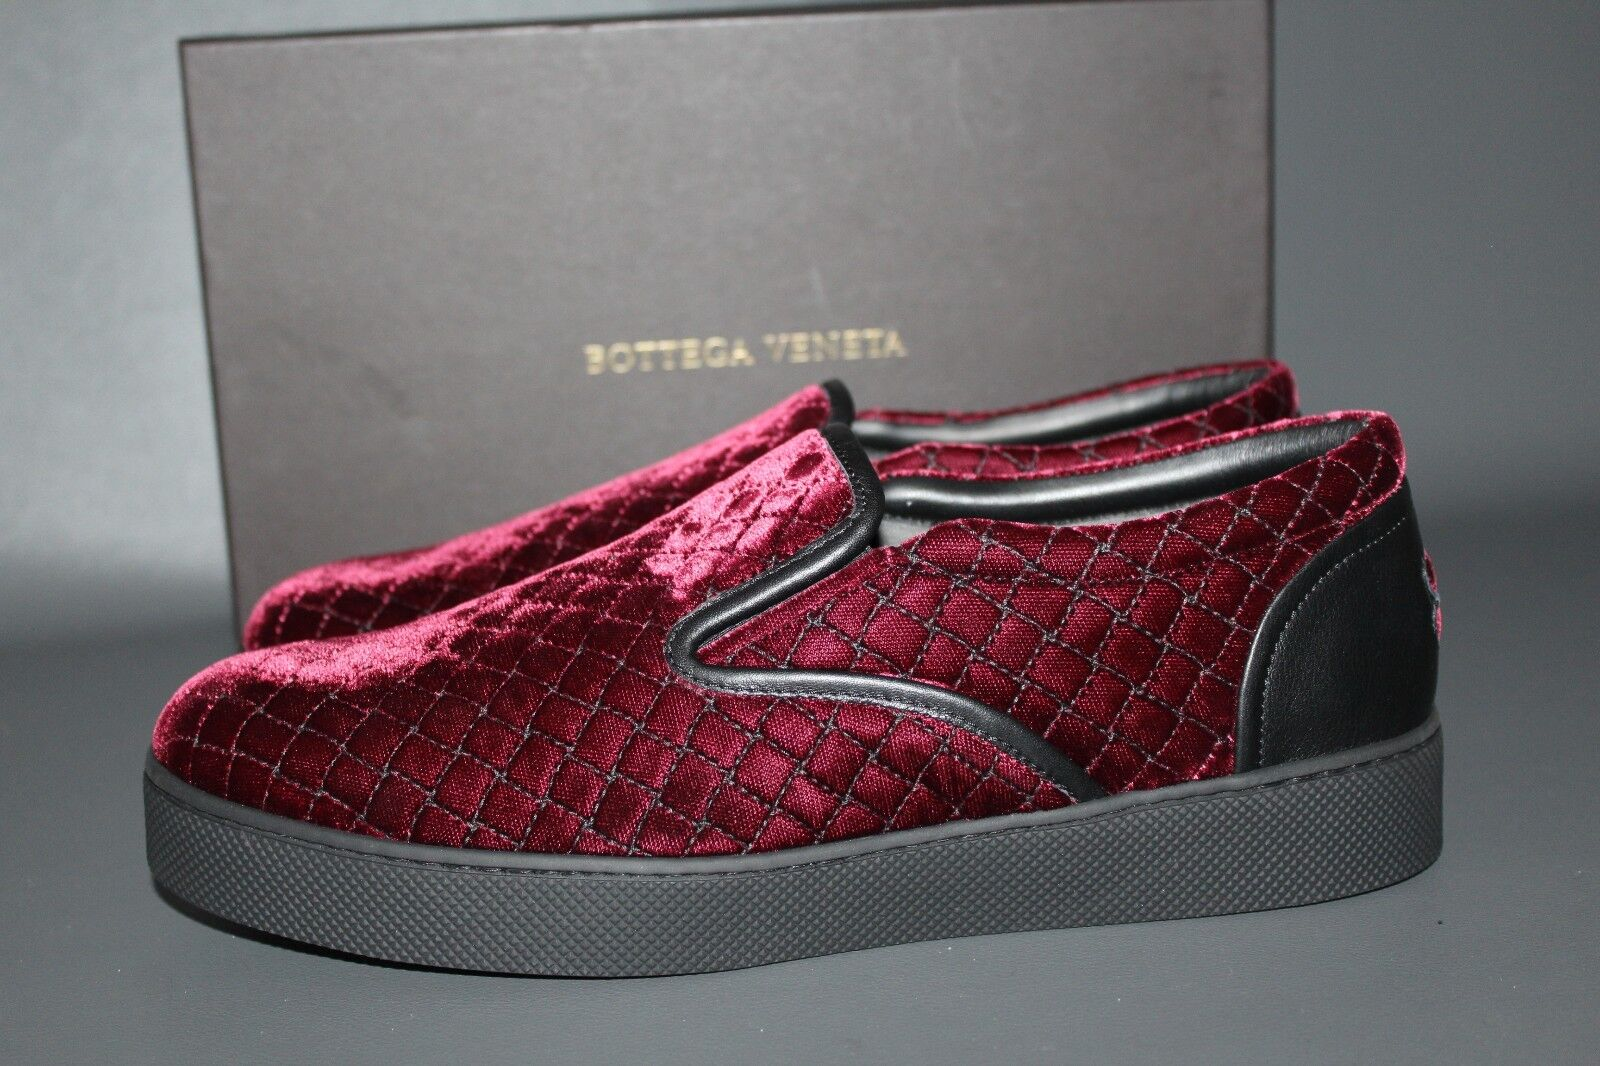 BOTTEGA VENETA Damen Schuhe Gr. 40 Slip On Sneaker Bordo Suede Made in Italy NEU